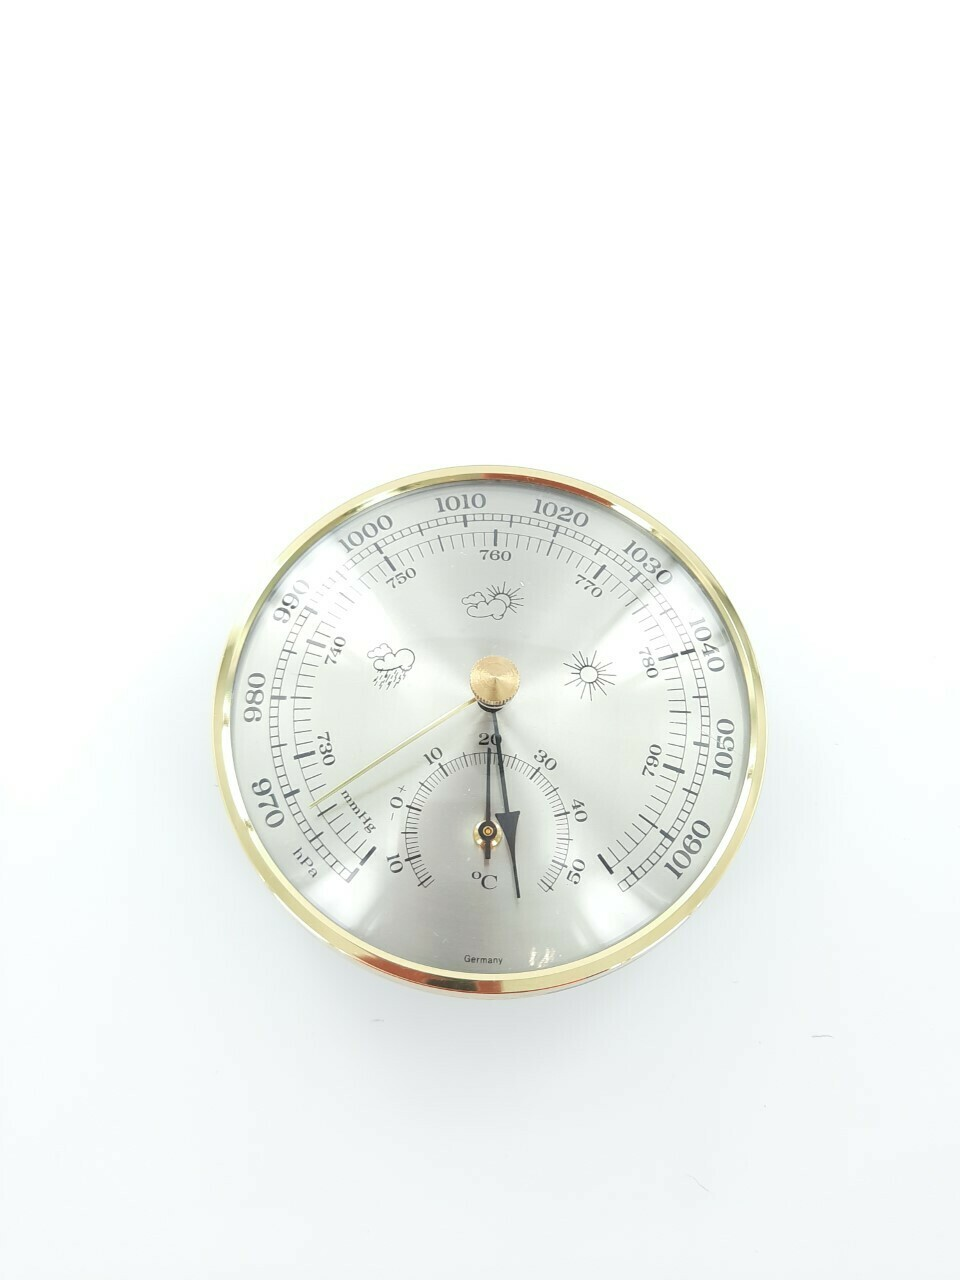 Baromètre/ Thermomètre K1 100891